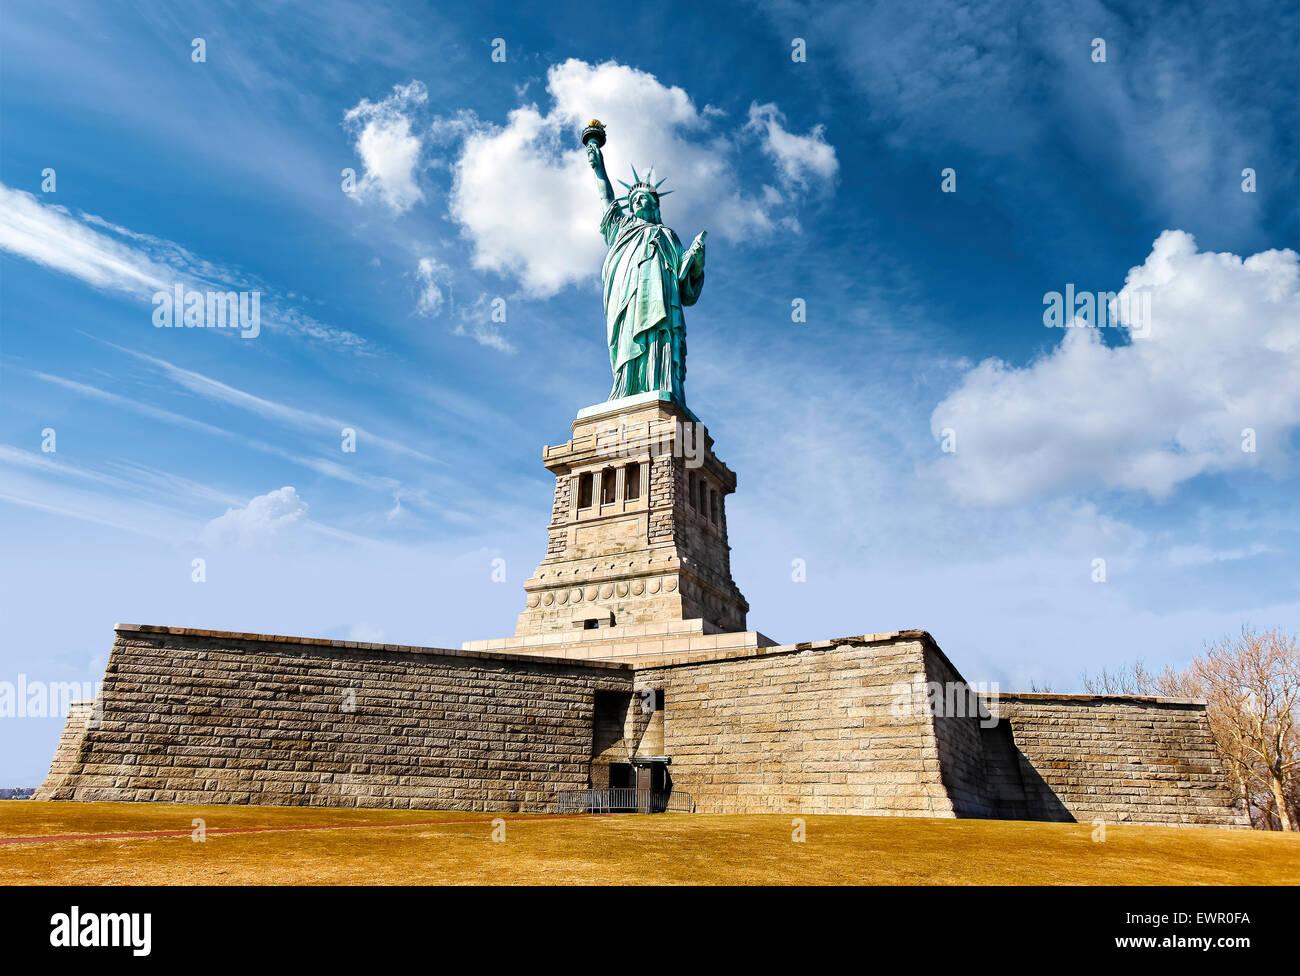 Statue de la Liberté à New York, USA. Photo Stock